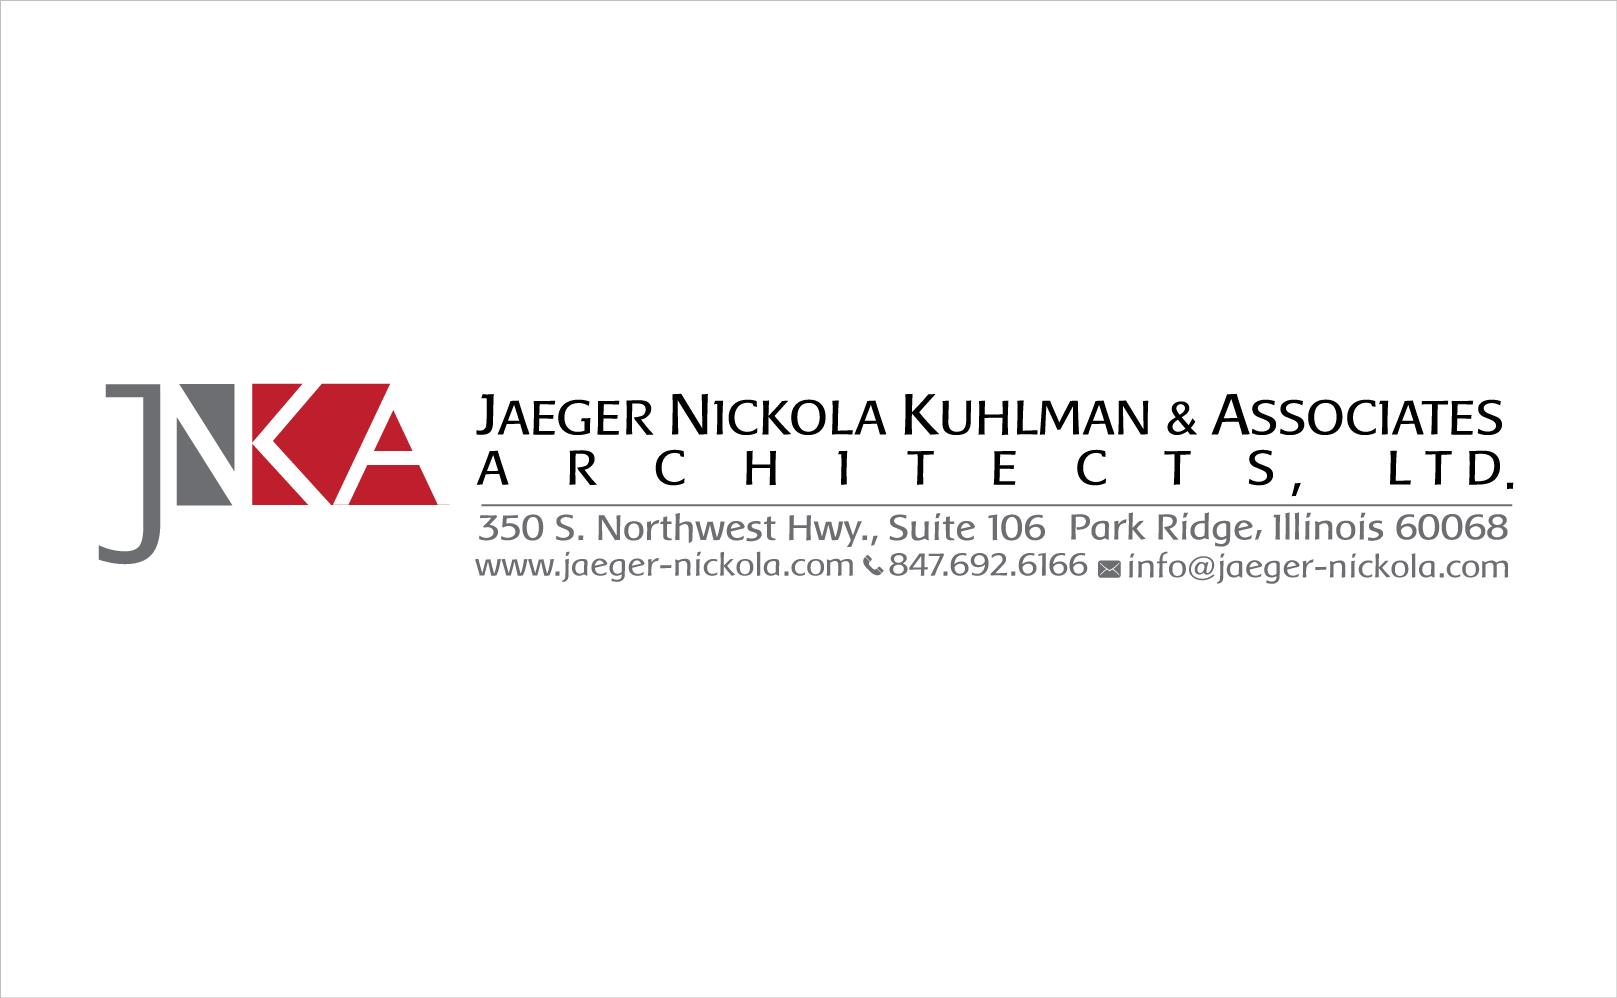 New logo wanted for JNK&A or JNKA or JNK (optional: Jaeger Nickola Kuhlman & Associates Architects, Ltd.)